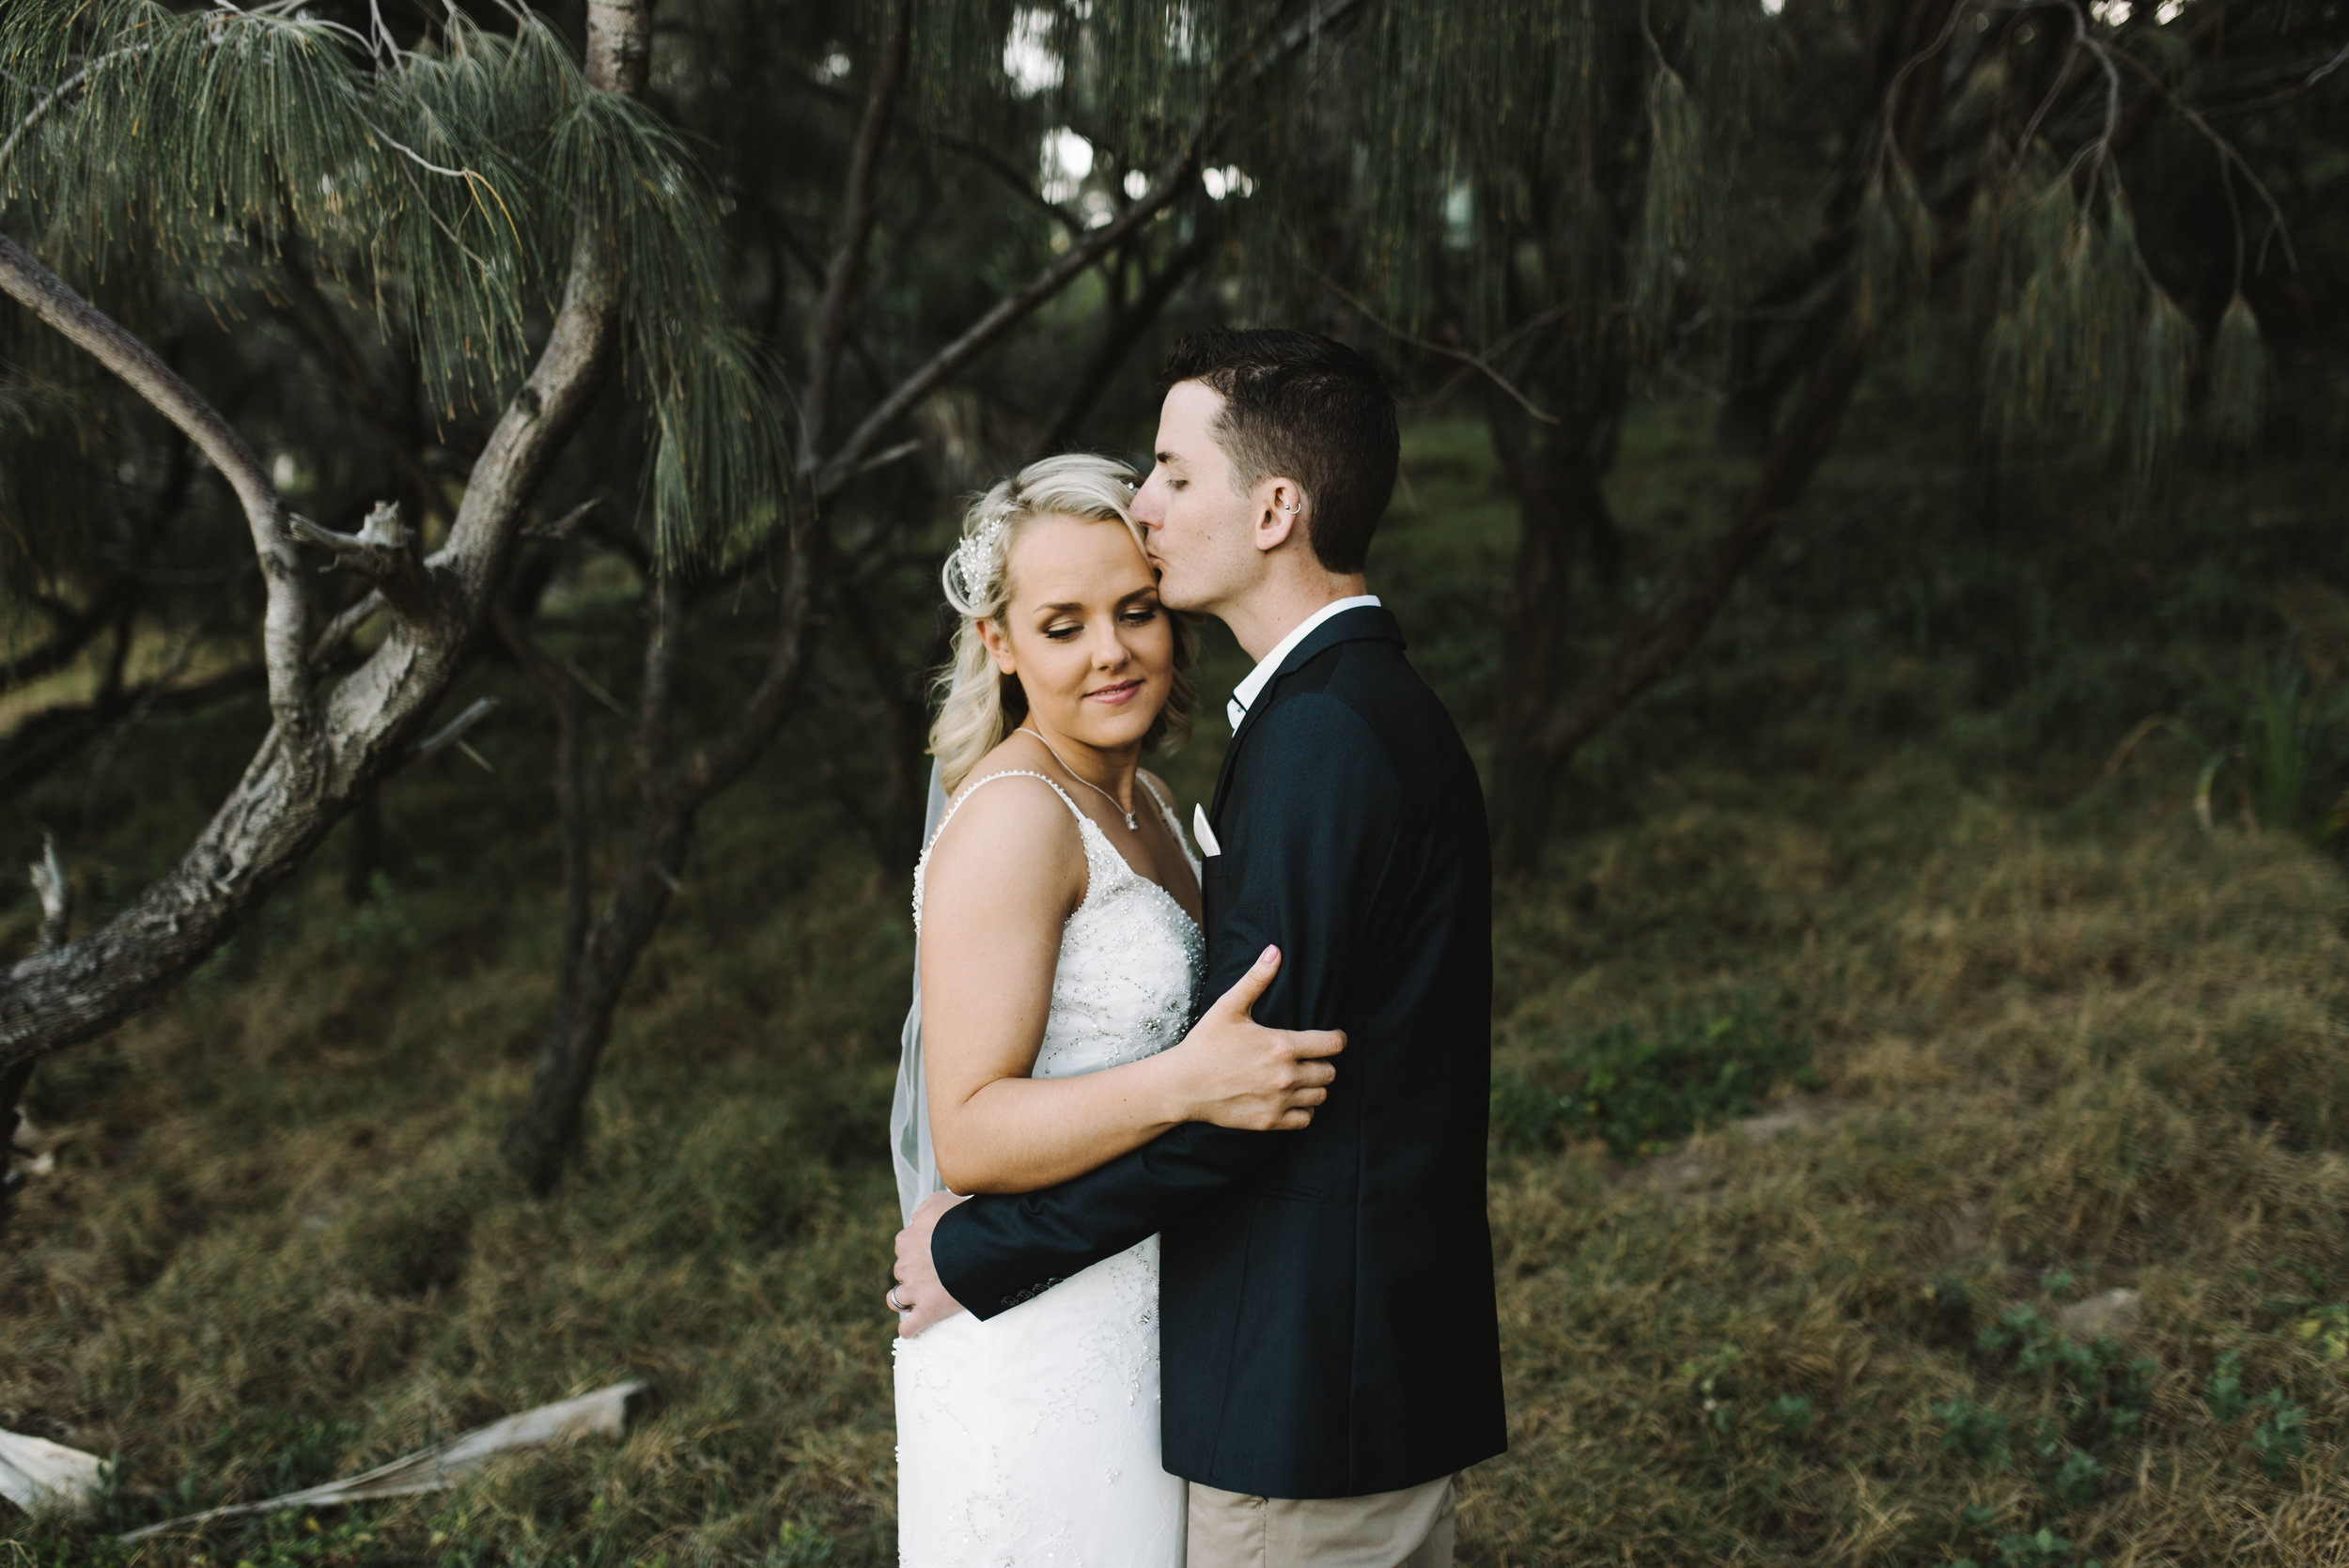 sunshine-coast-wedding-photography-55.jpg